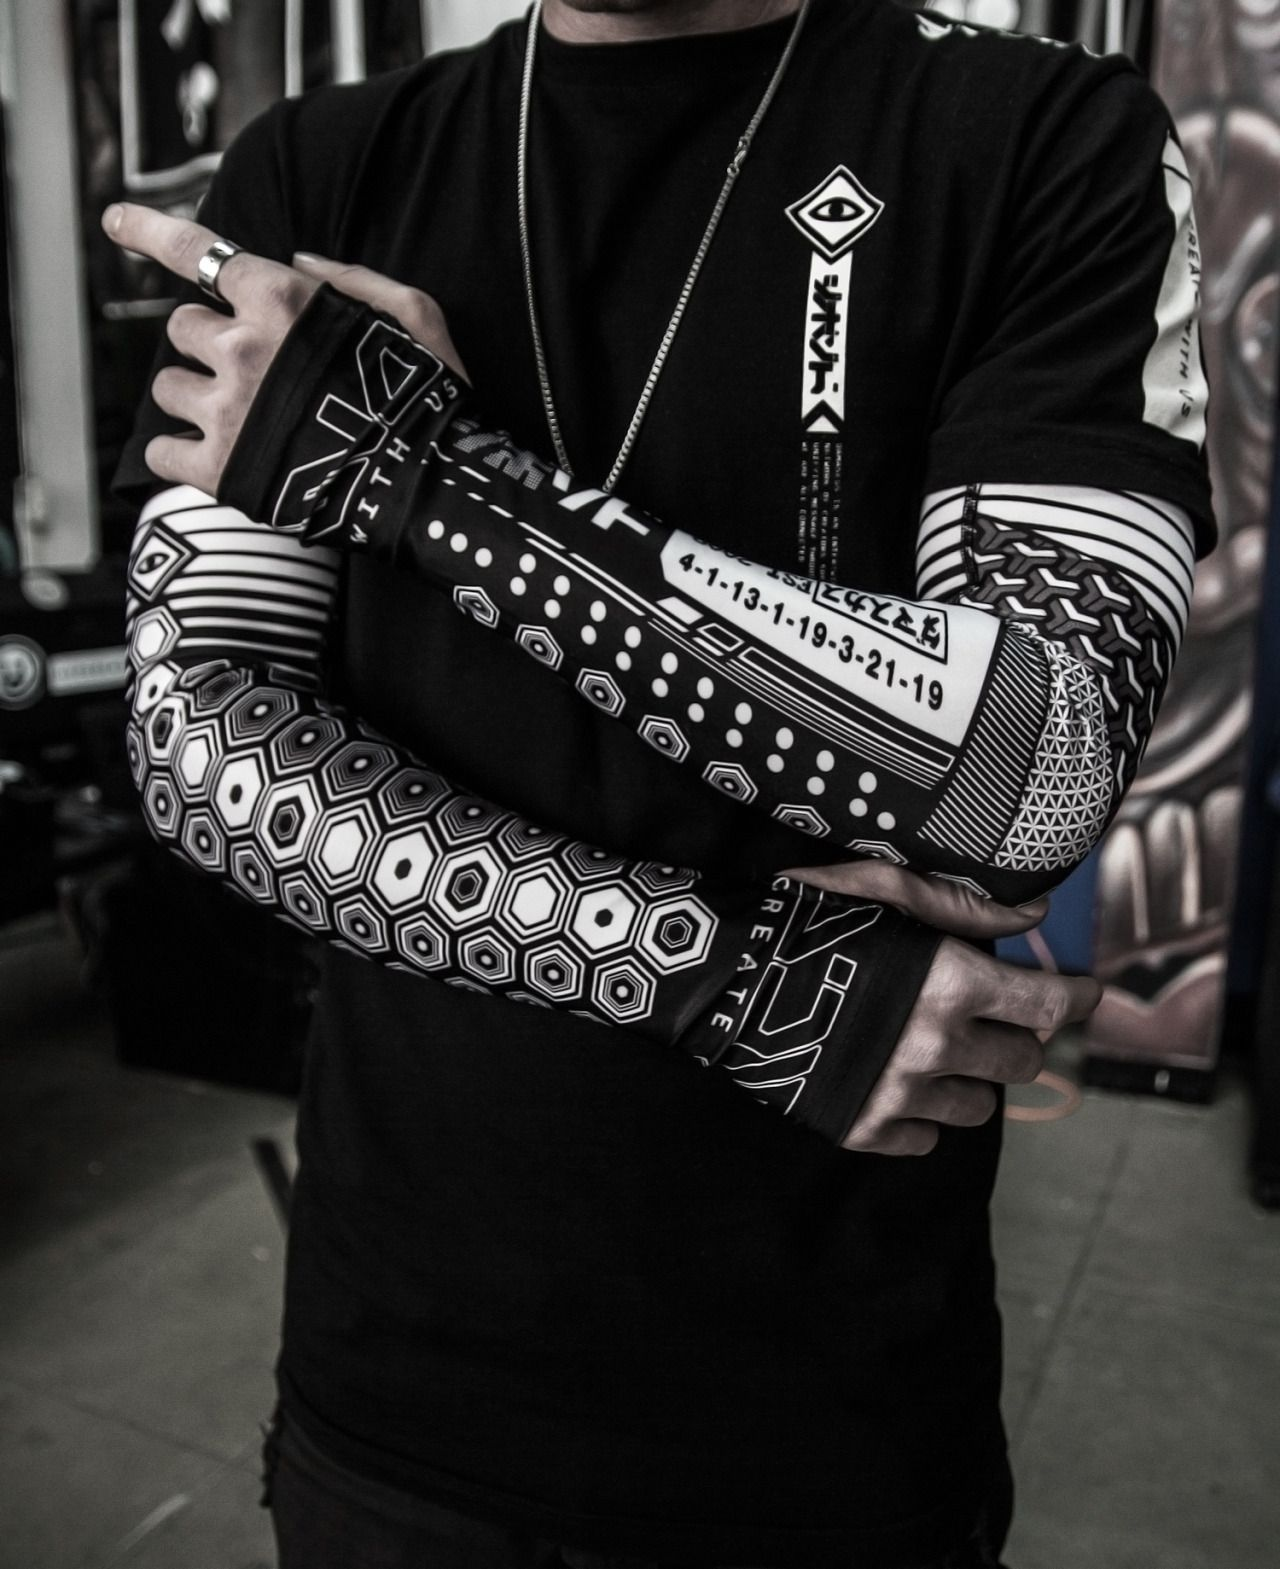 Damascus Apparel Power Sleeves Out This Monday Cyberpunk Fashion Street Wear Urban Dark Fashion